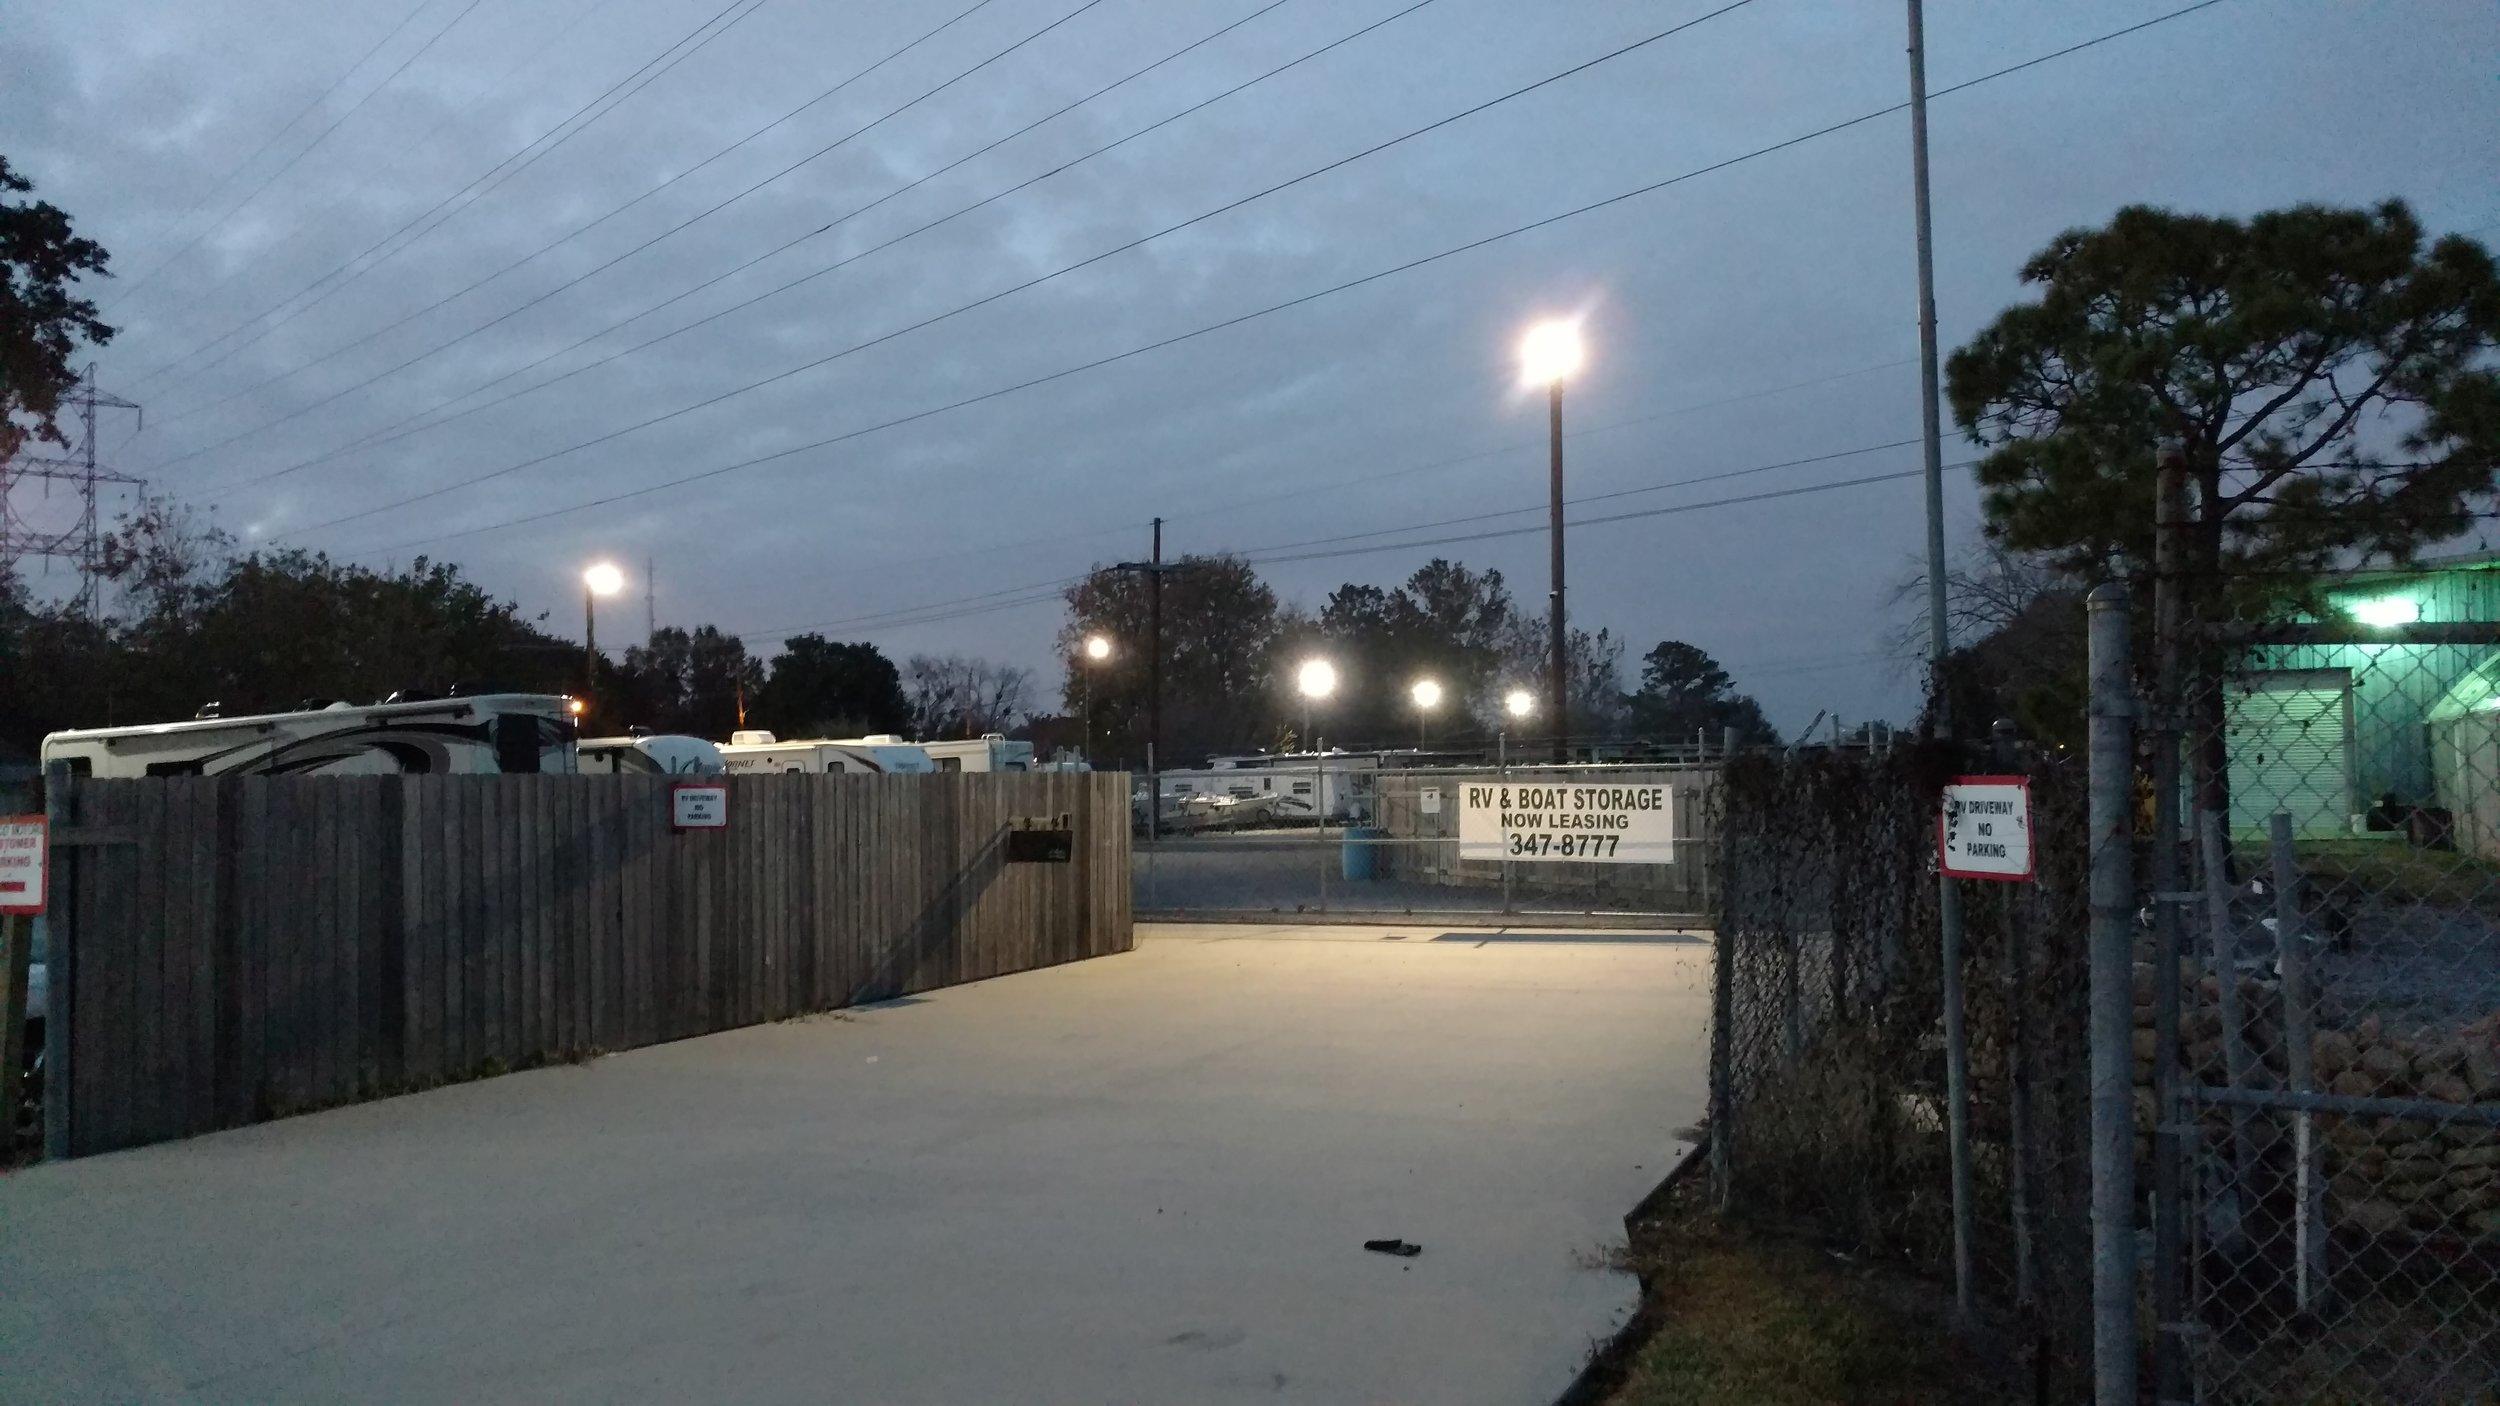 Rv & Boat Storage  Lights on.jpg